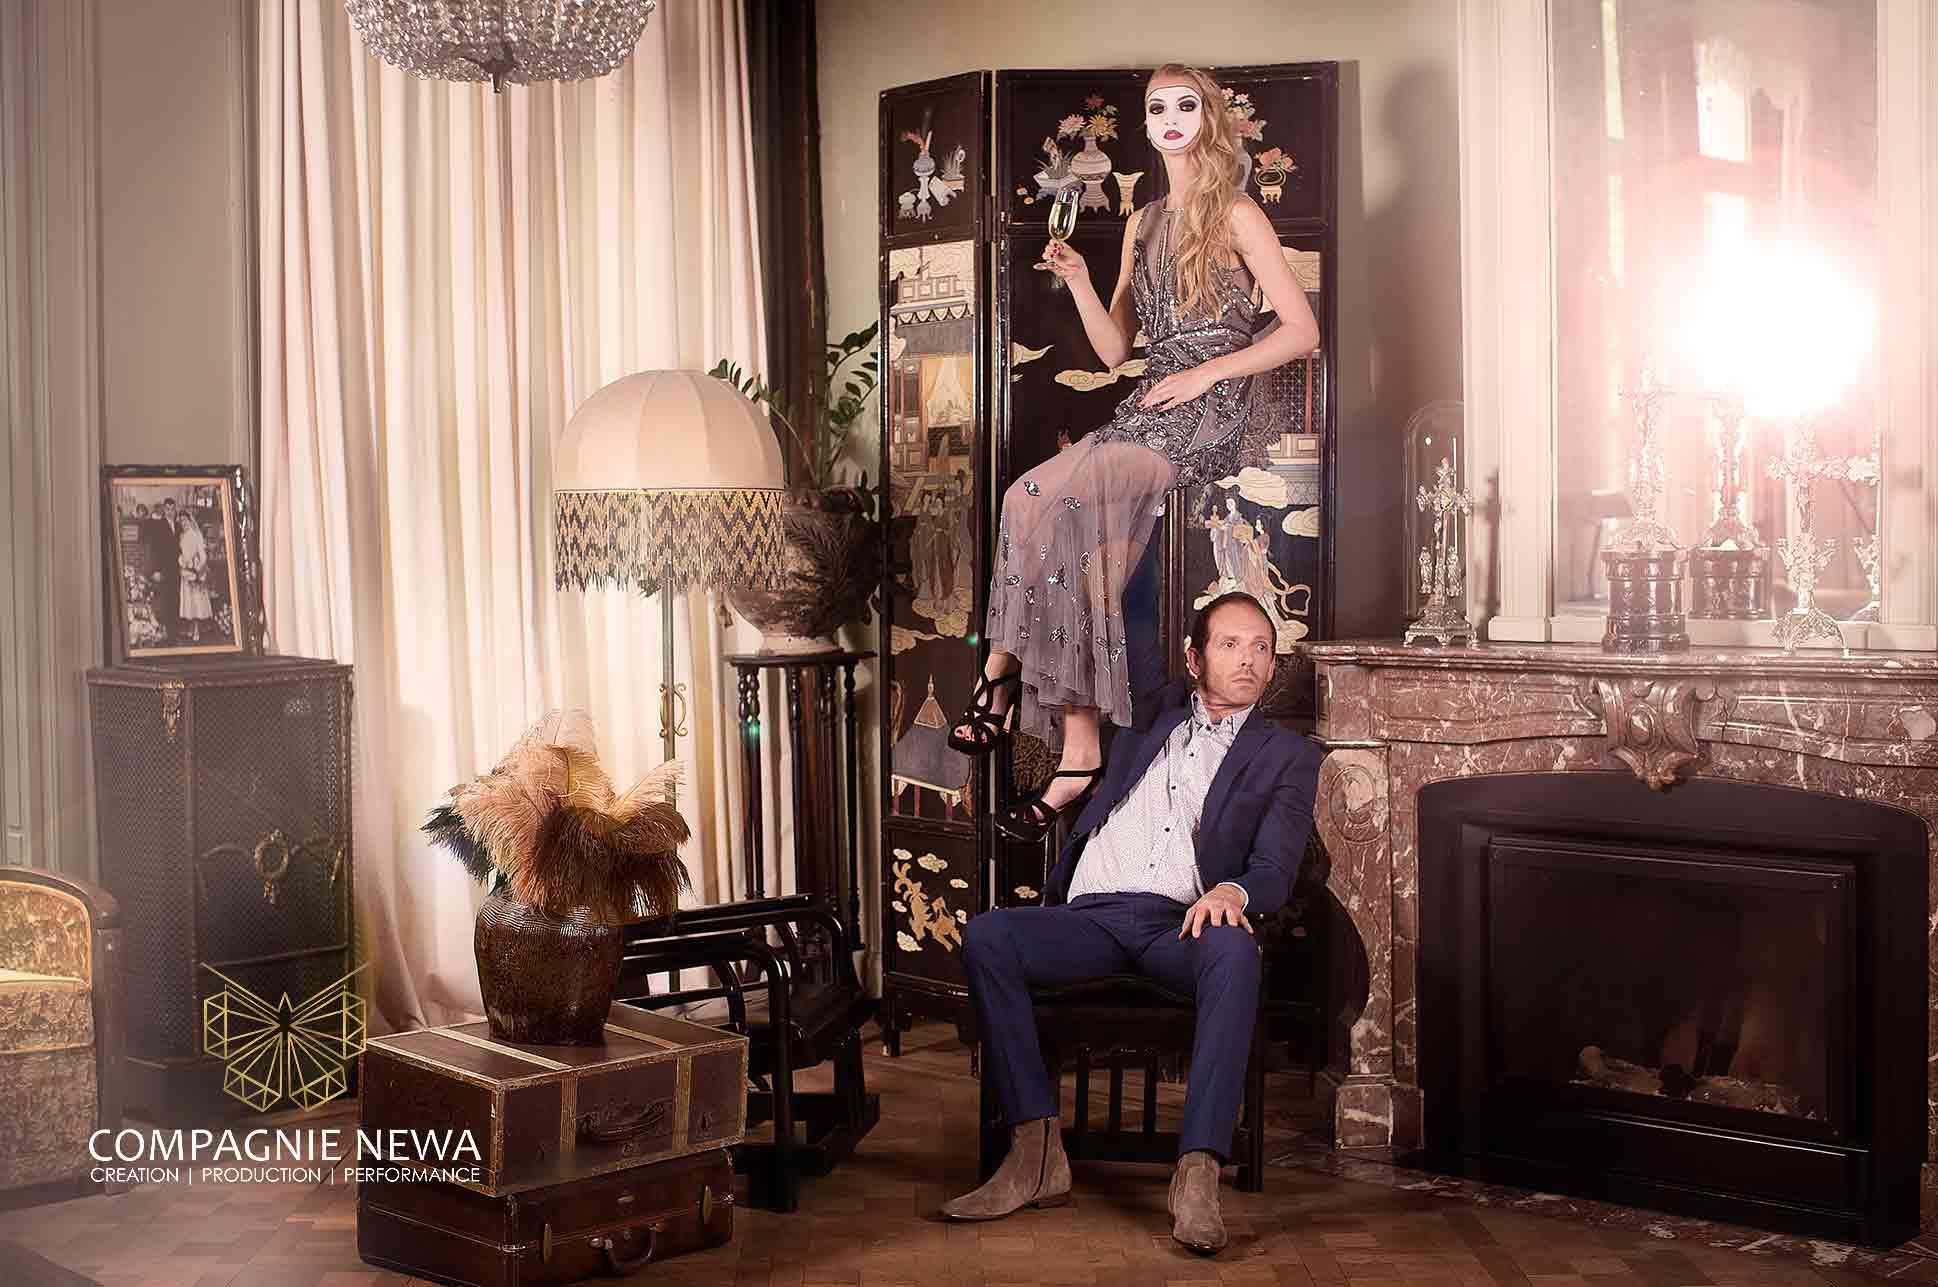 Compagnie_NEWA_lifeisazirkus_acro_handtohand_balans_circus_photoshoot